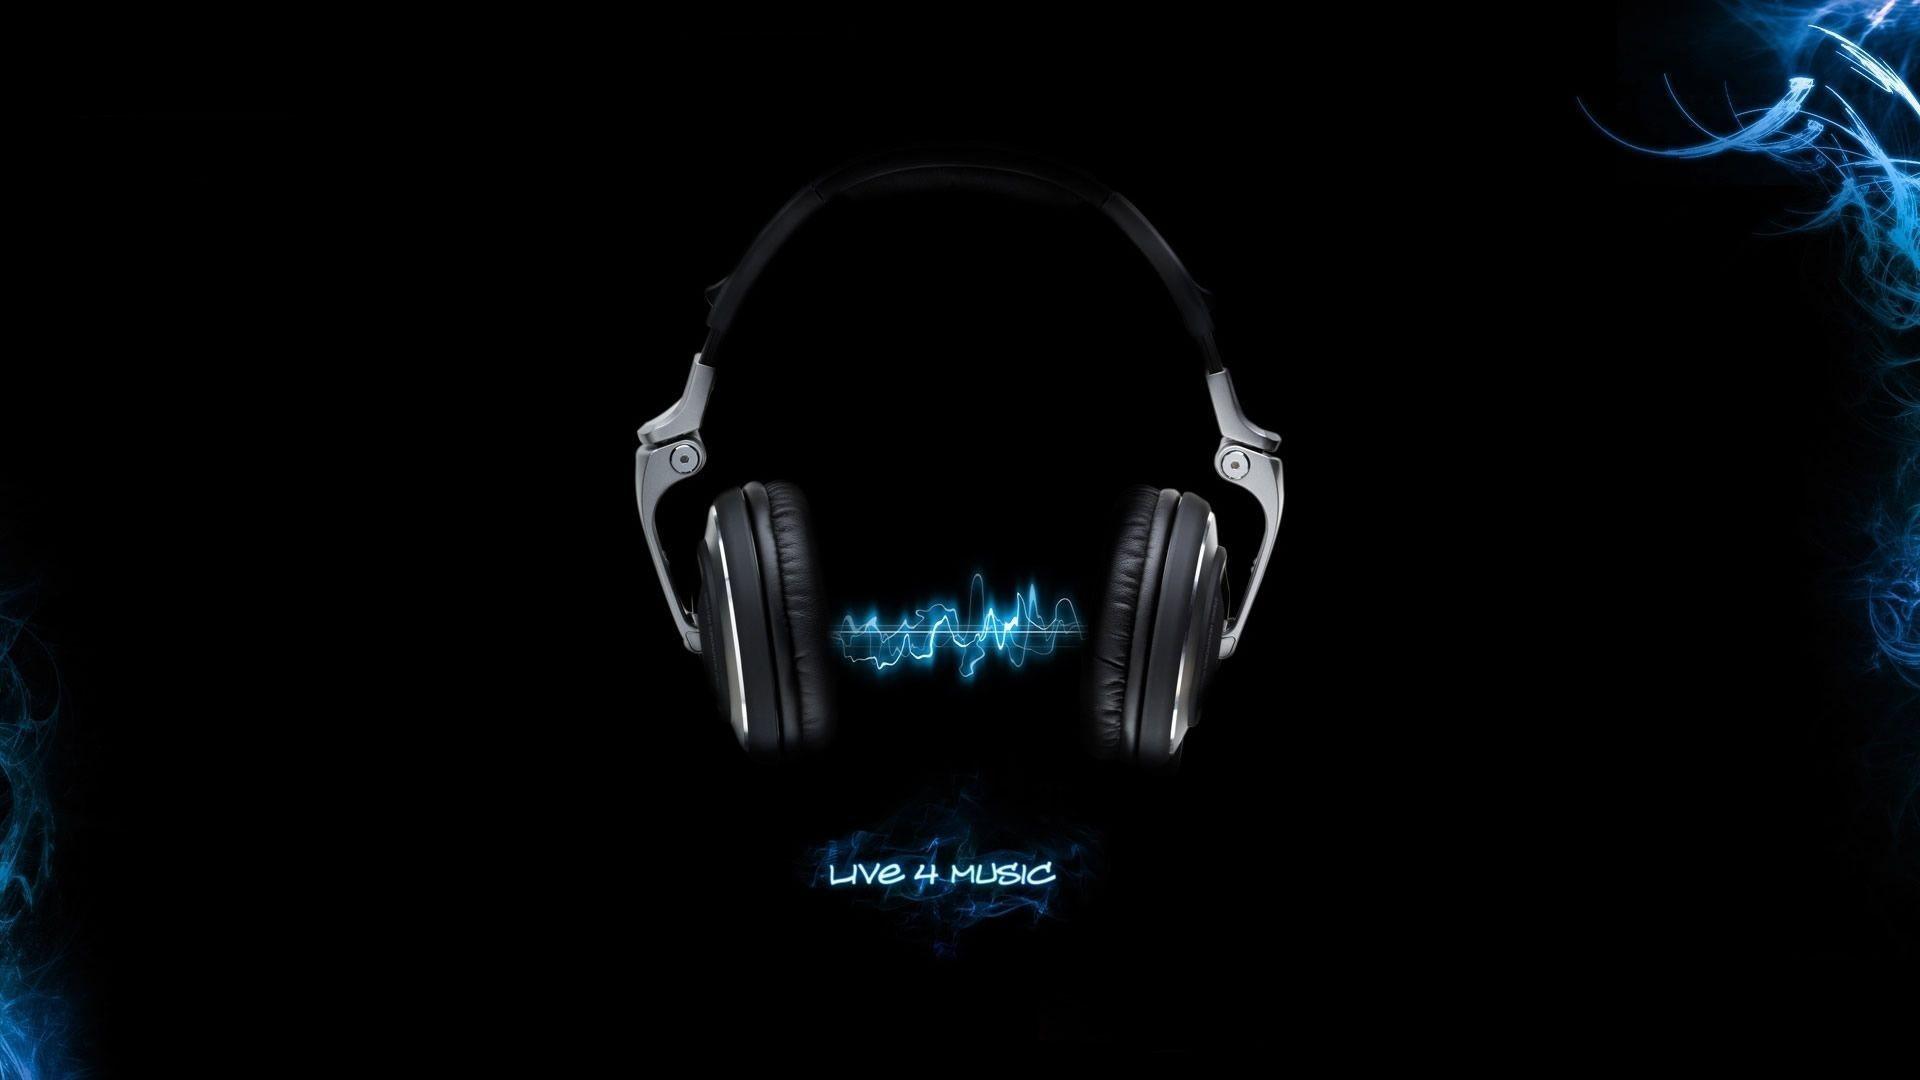 Live Music 3D HD Background #17150 Wallpaper